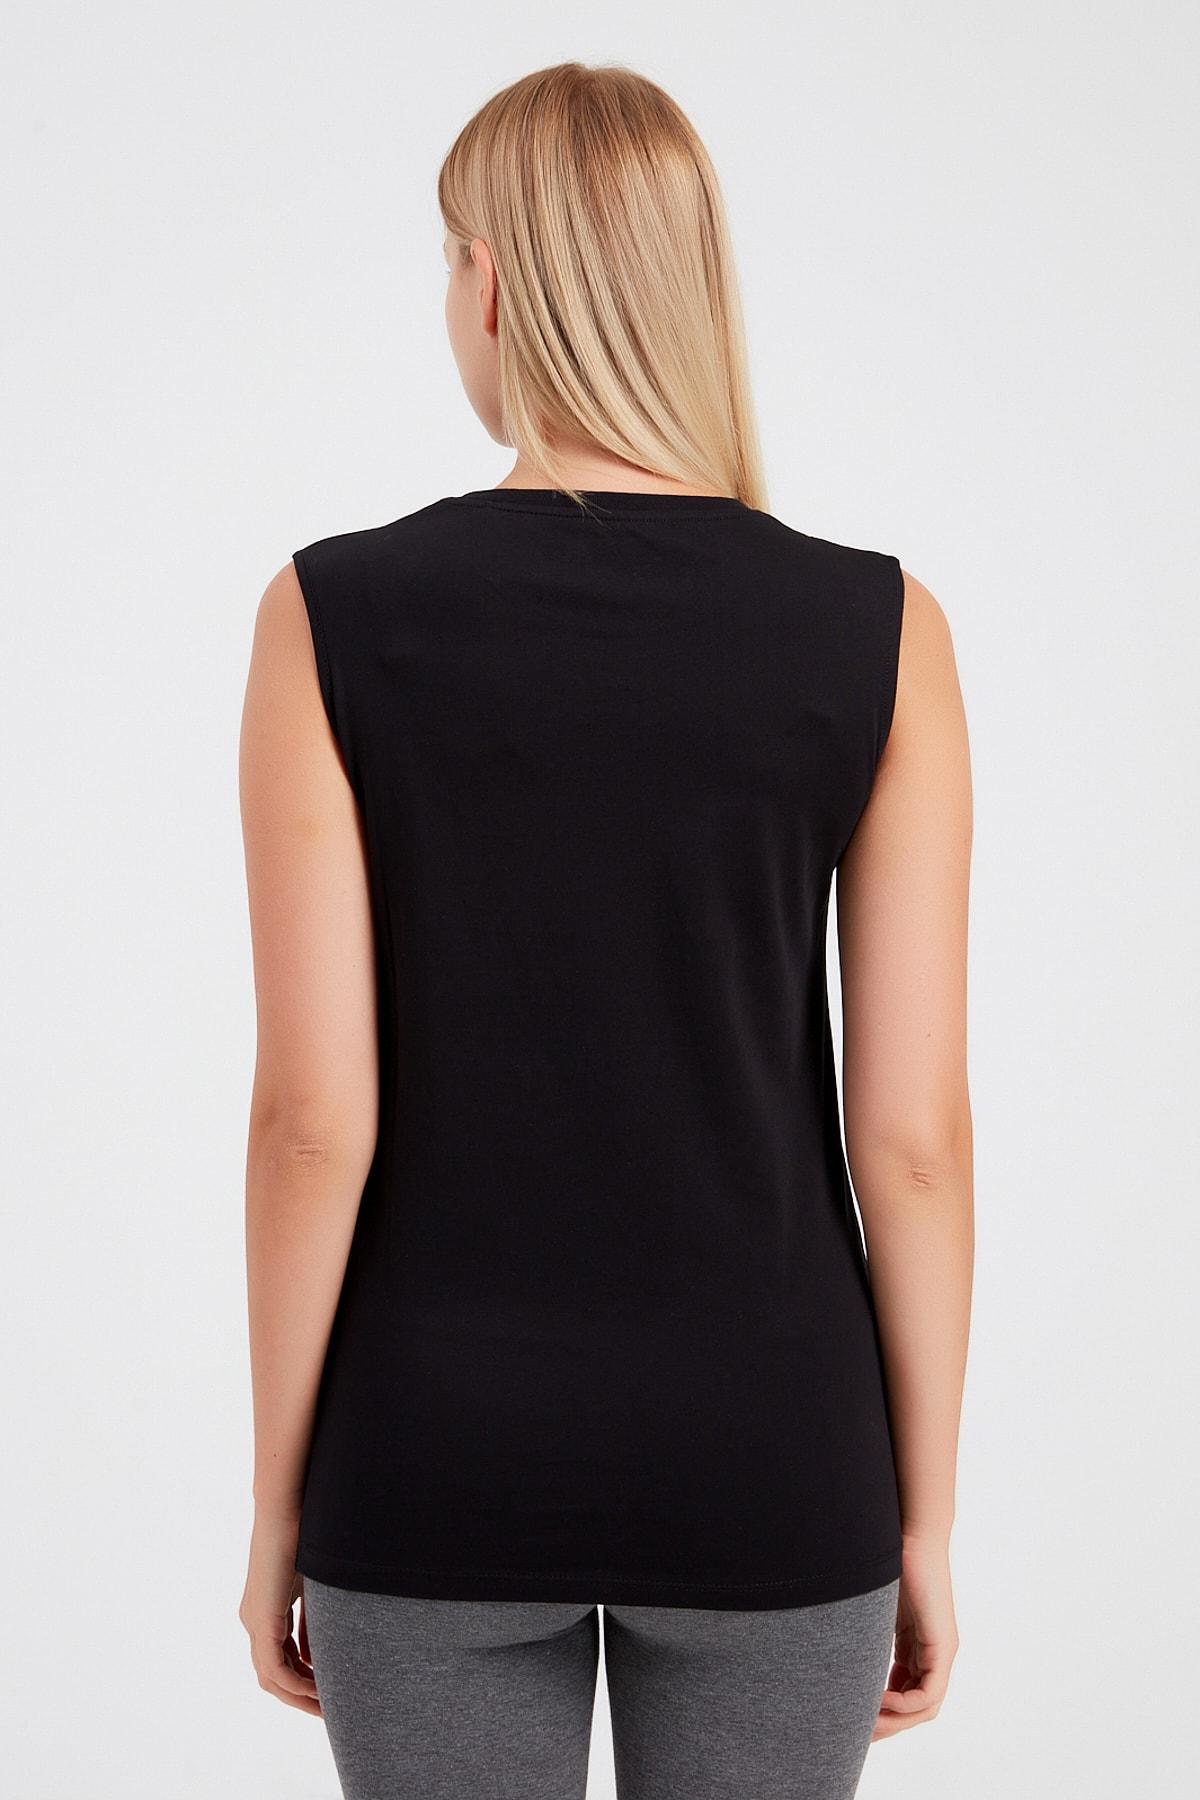 New Balance Kadın T-shirt - Vom Athlete Tee - V-WTT917-BK 2